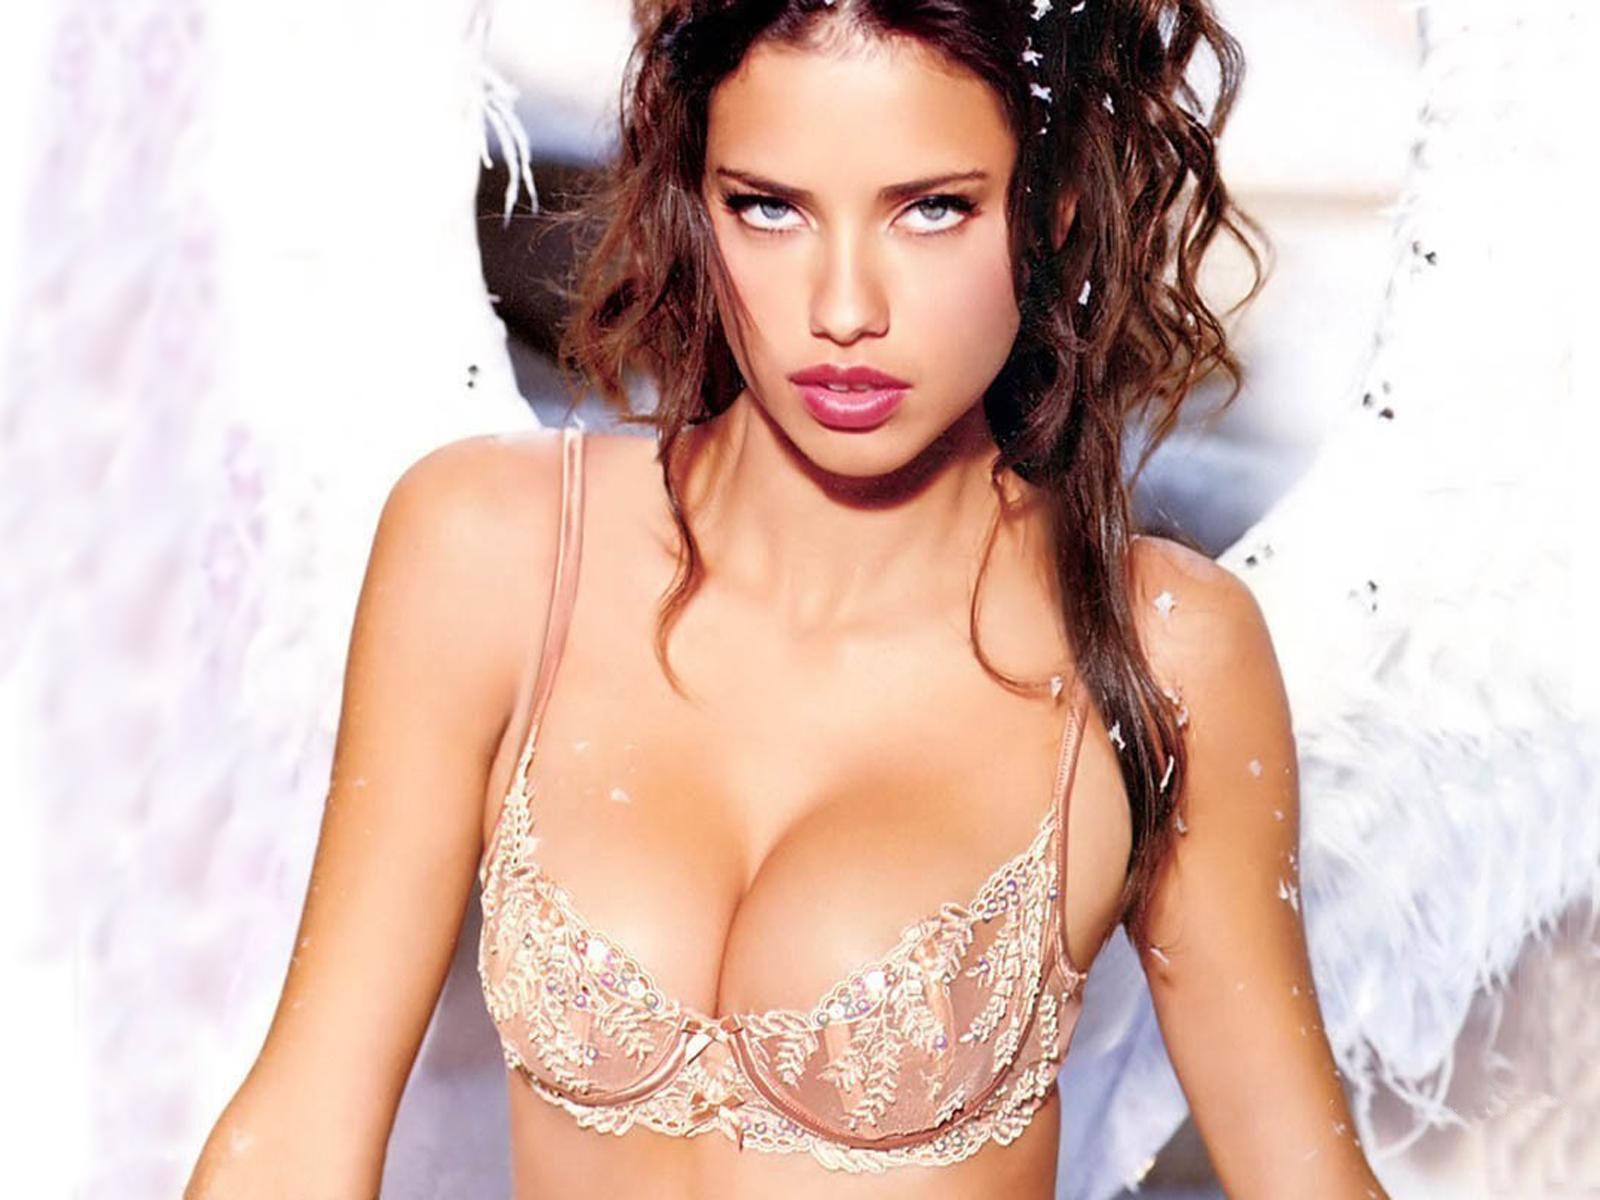 http://1.bp.blogspot.com/_nD_YgZuOadA/TJbqoSojpmI/AAAAAAAAA0c/bL7UyI_fWtc/s1600/adriana_lima06.jpg